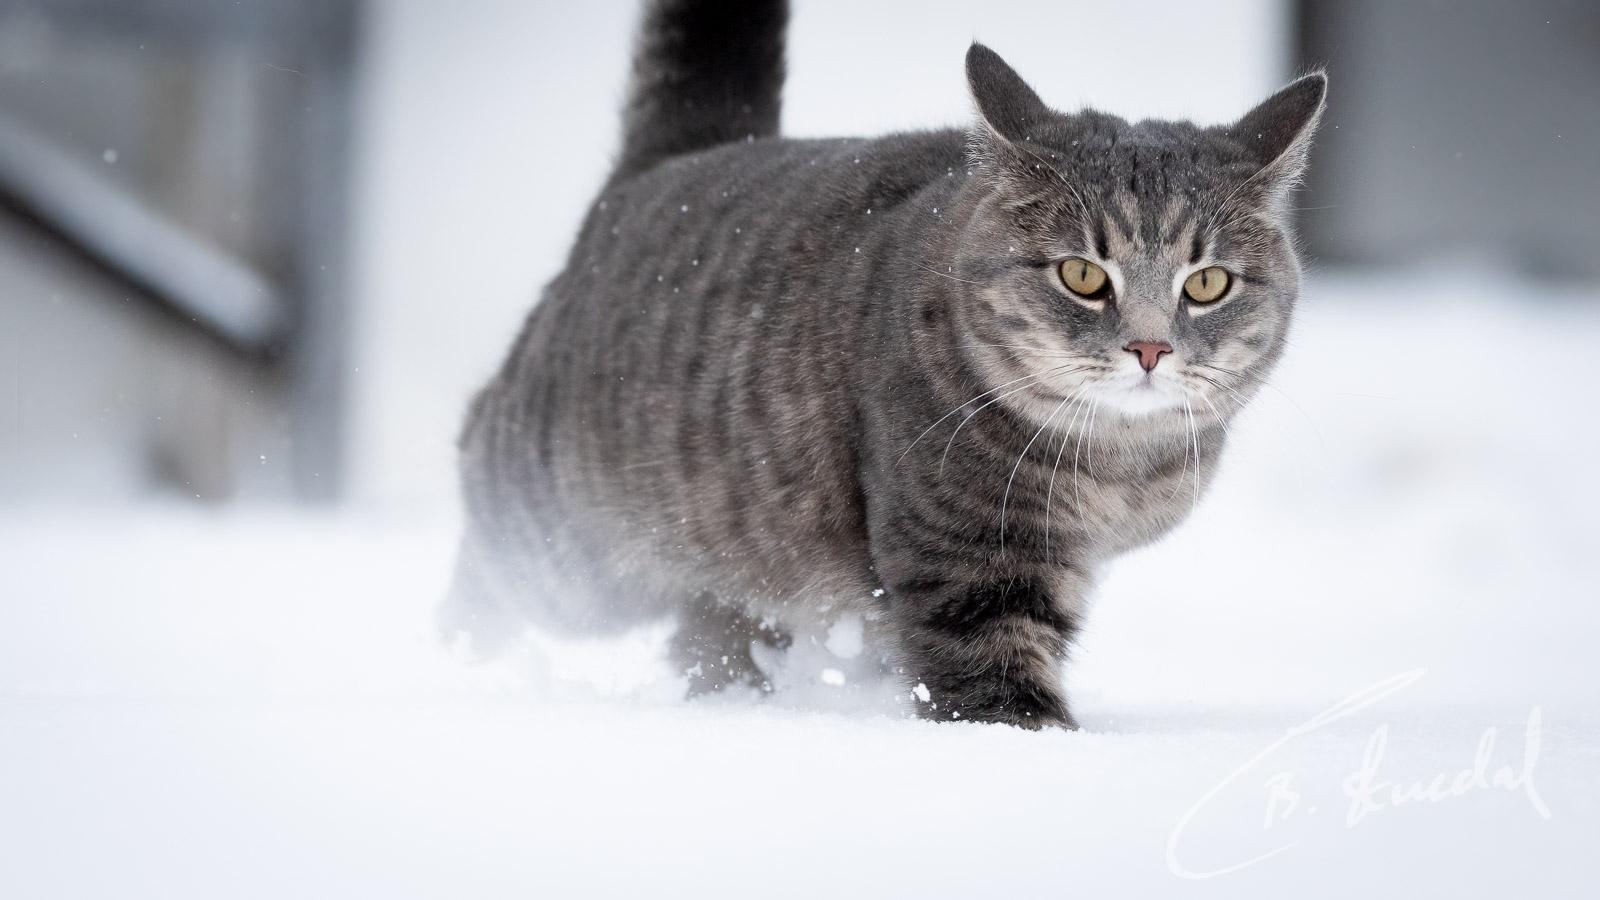 Snowy stride